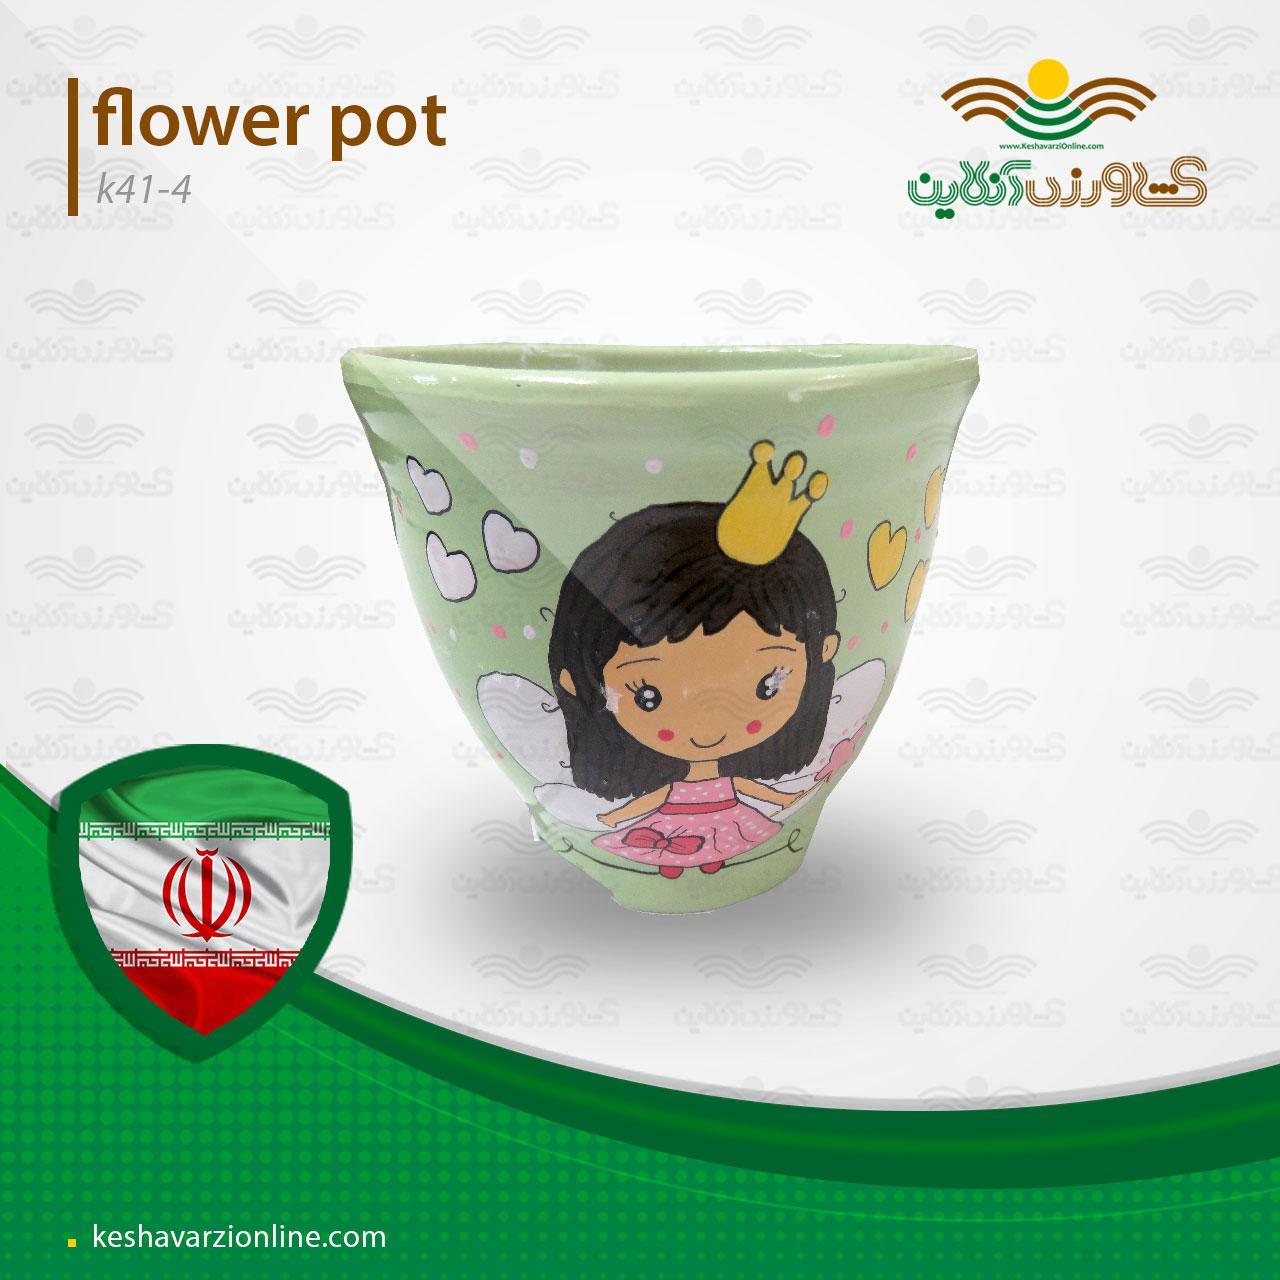 گلدان دکوری K41.4